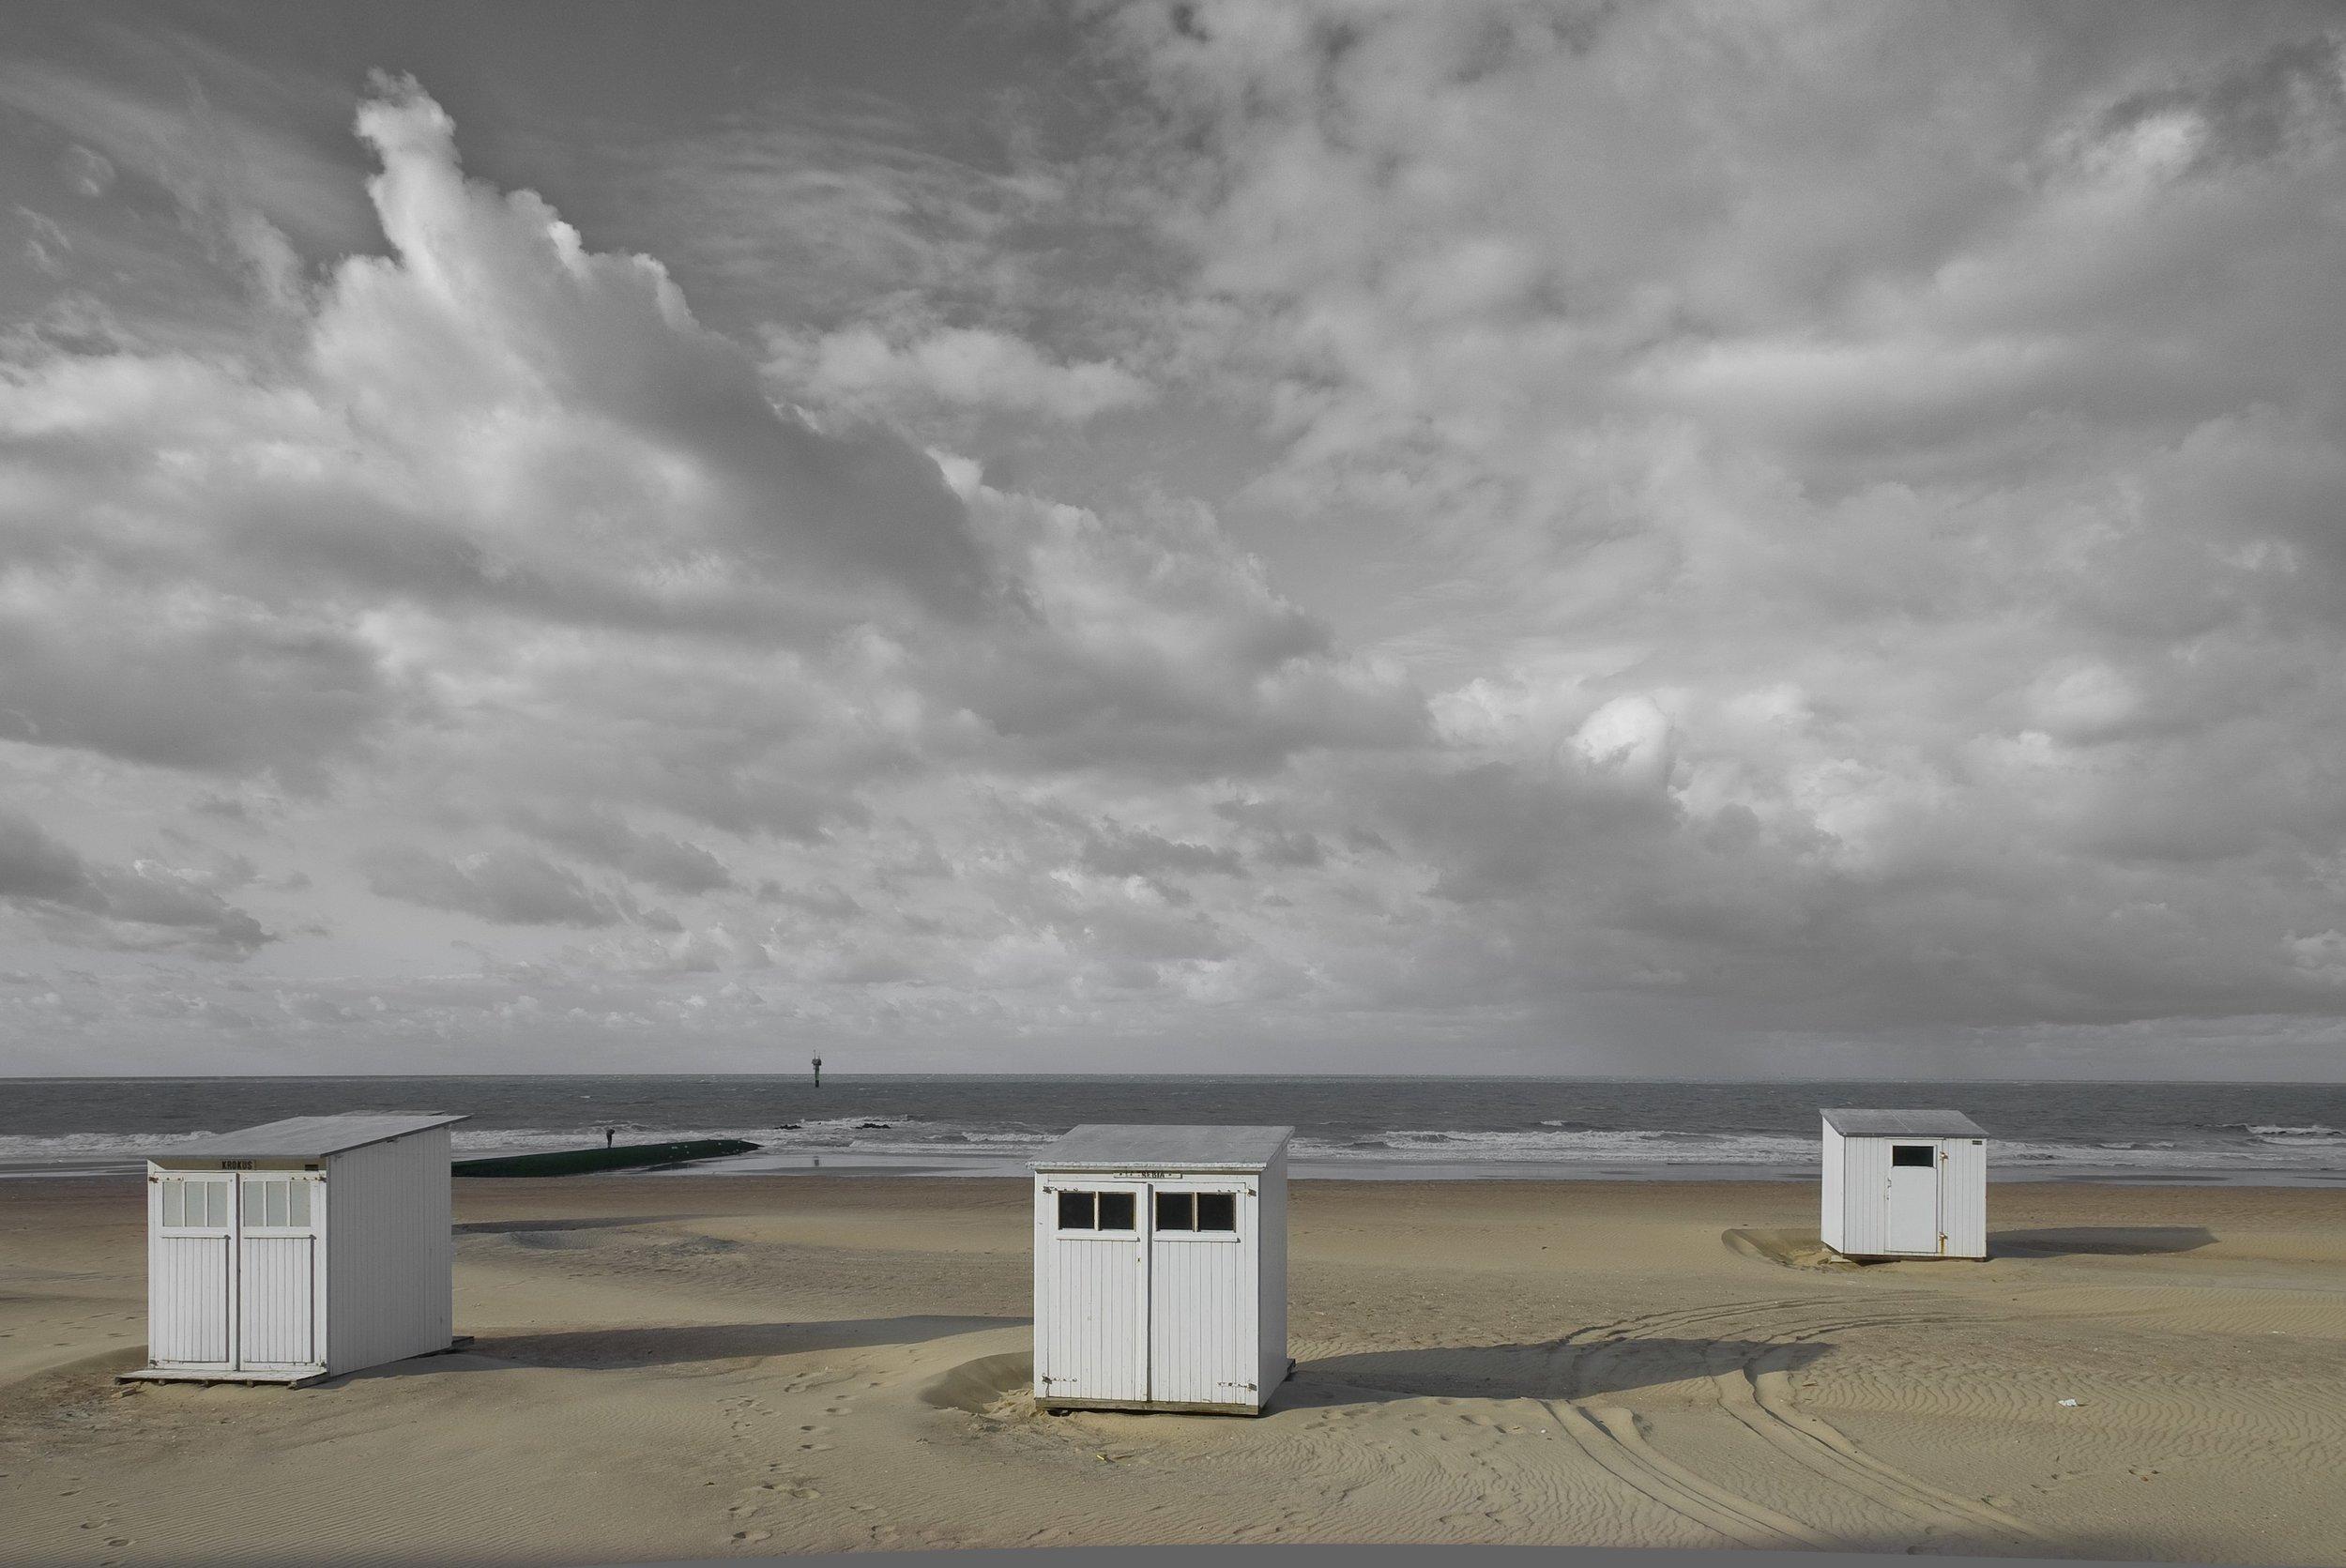 Three cabins